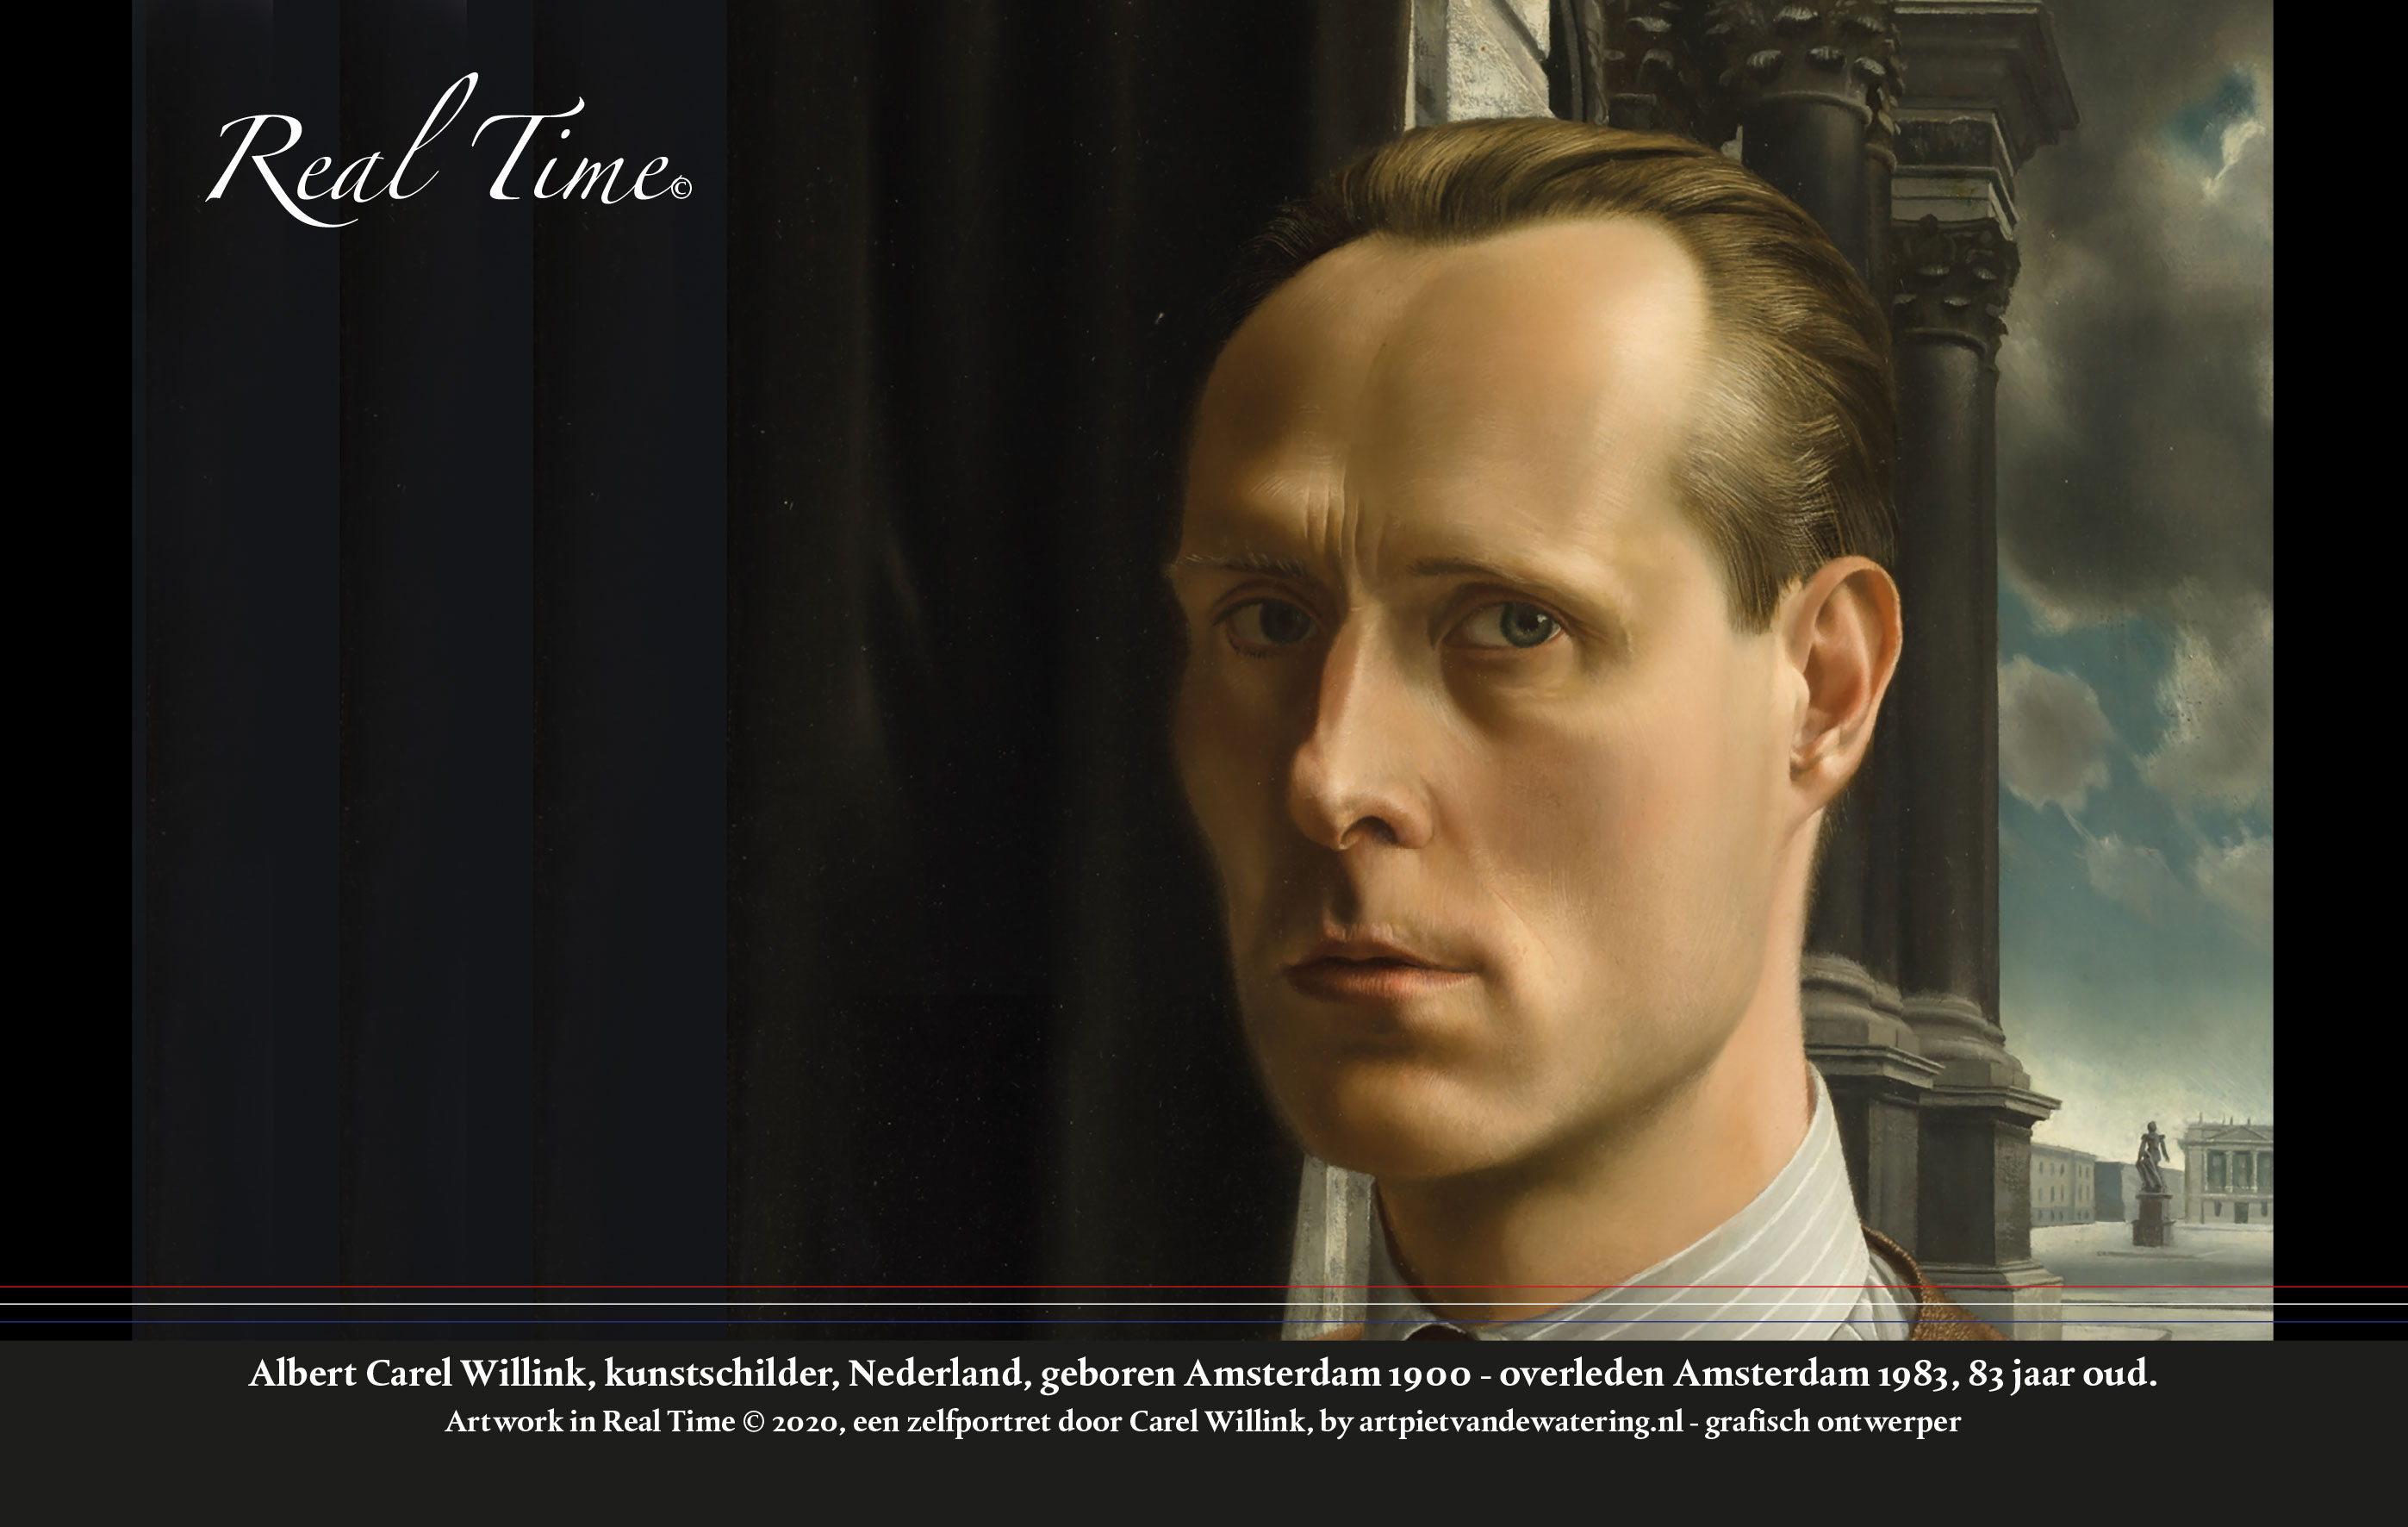 Albert-Carel-Willink-1900-1983